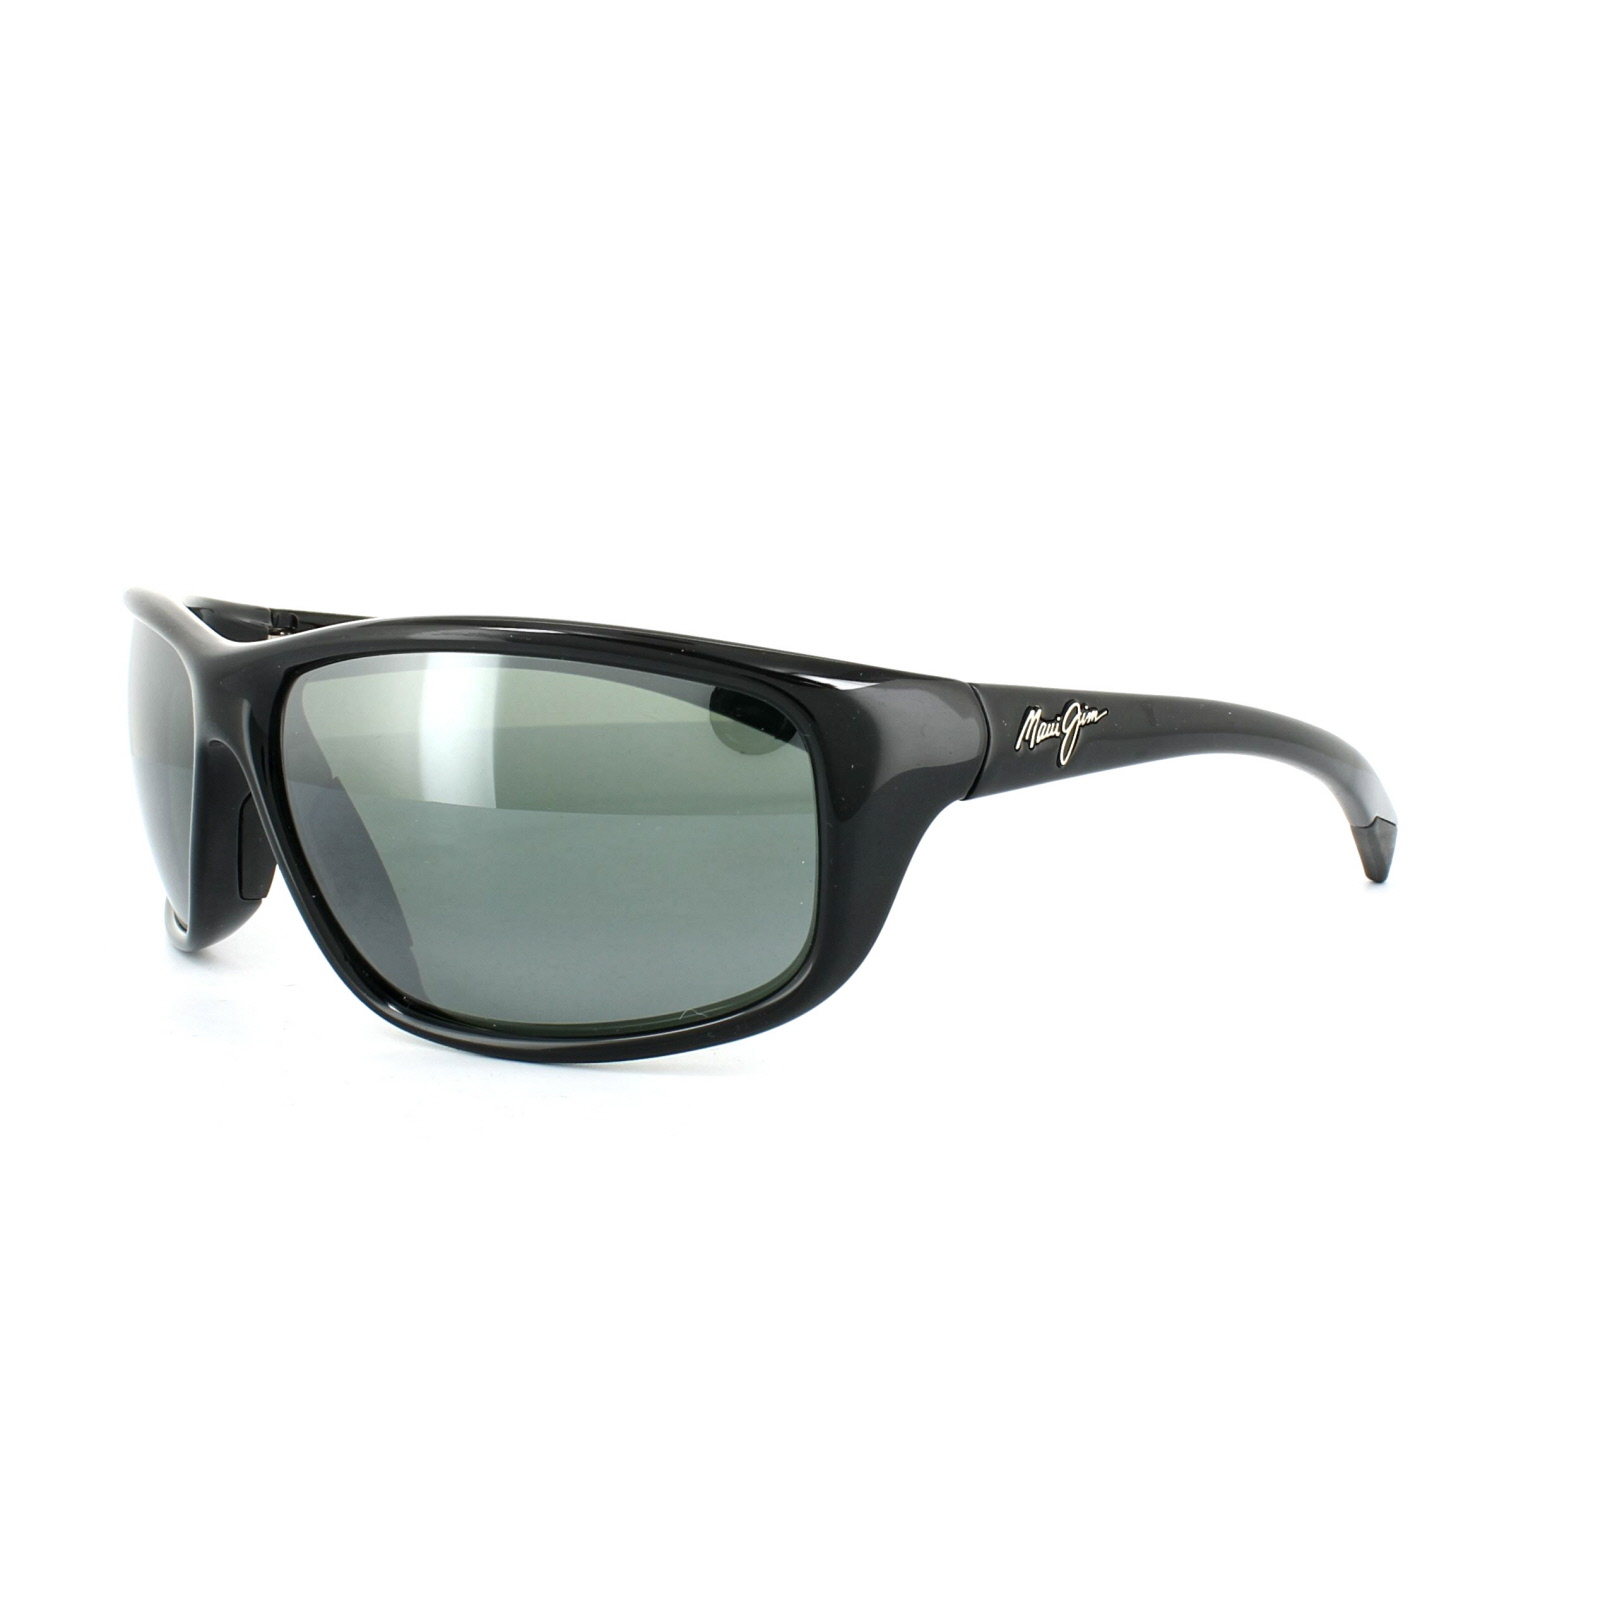 d2dbe142c6 Maui Jim Sunglasses In Cozumel